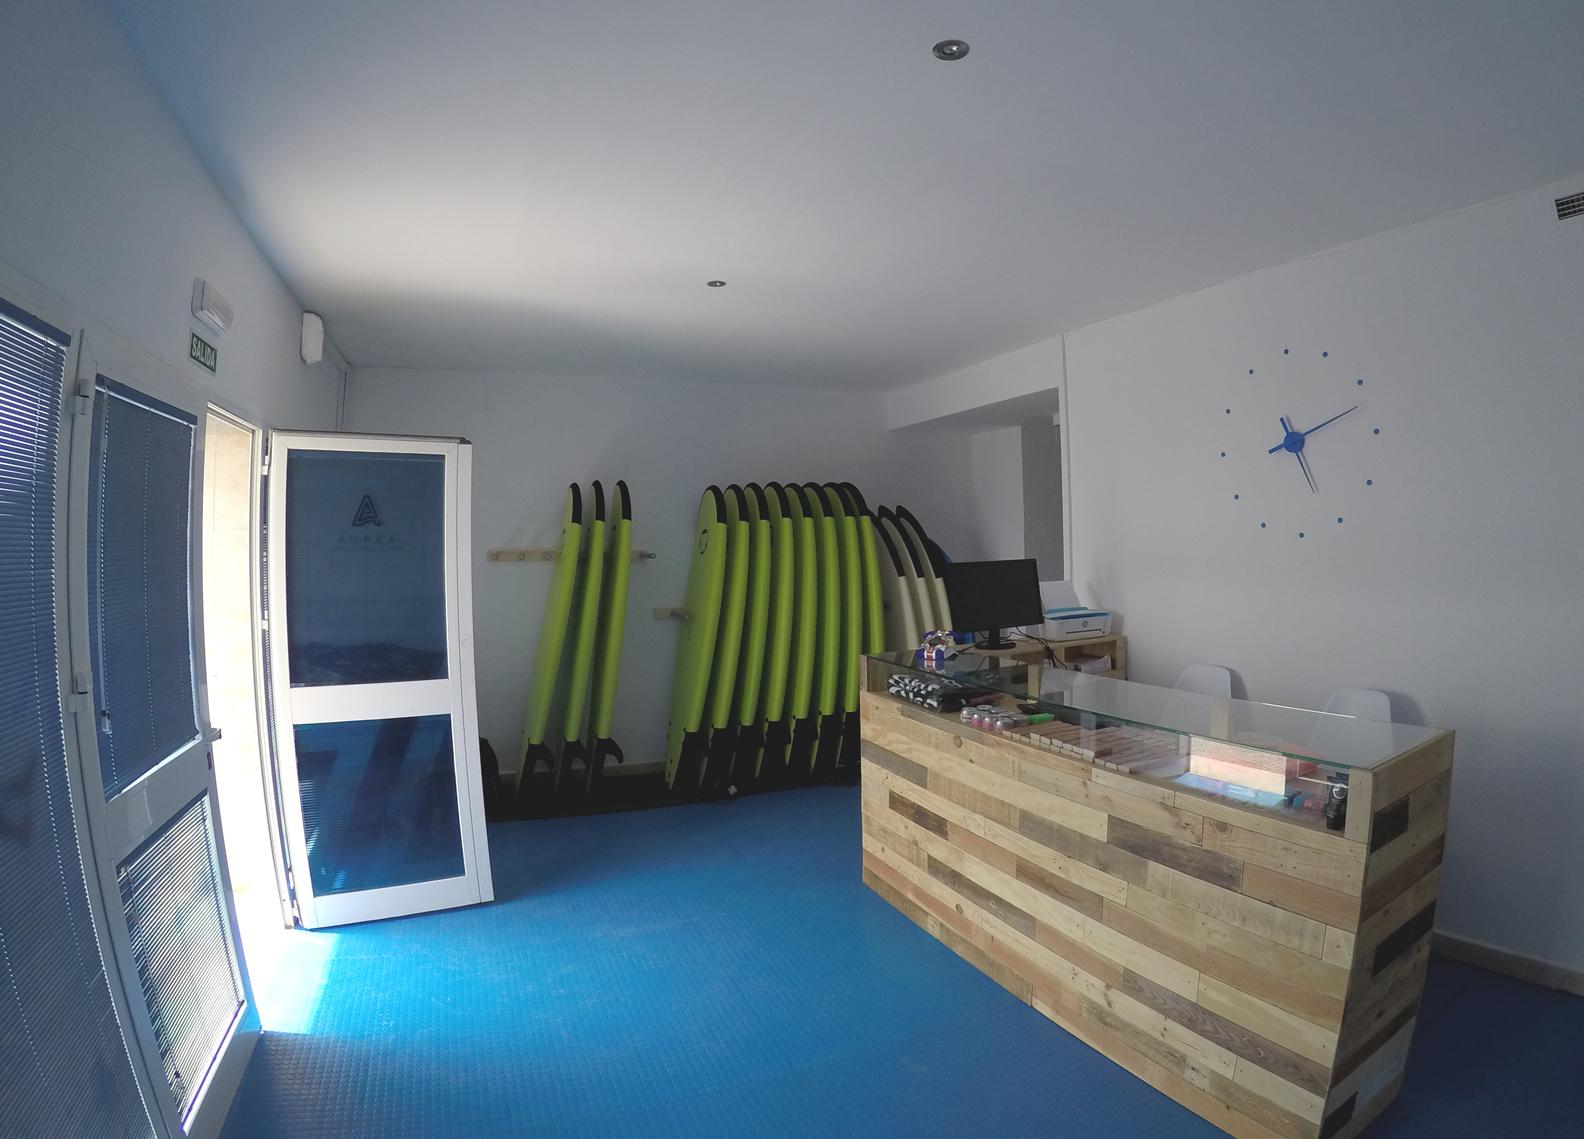 aurea.surf.cadiz.entrada.jpg